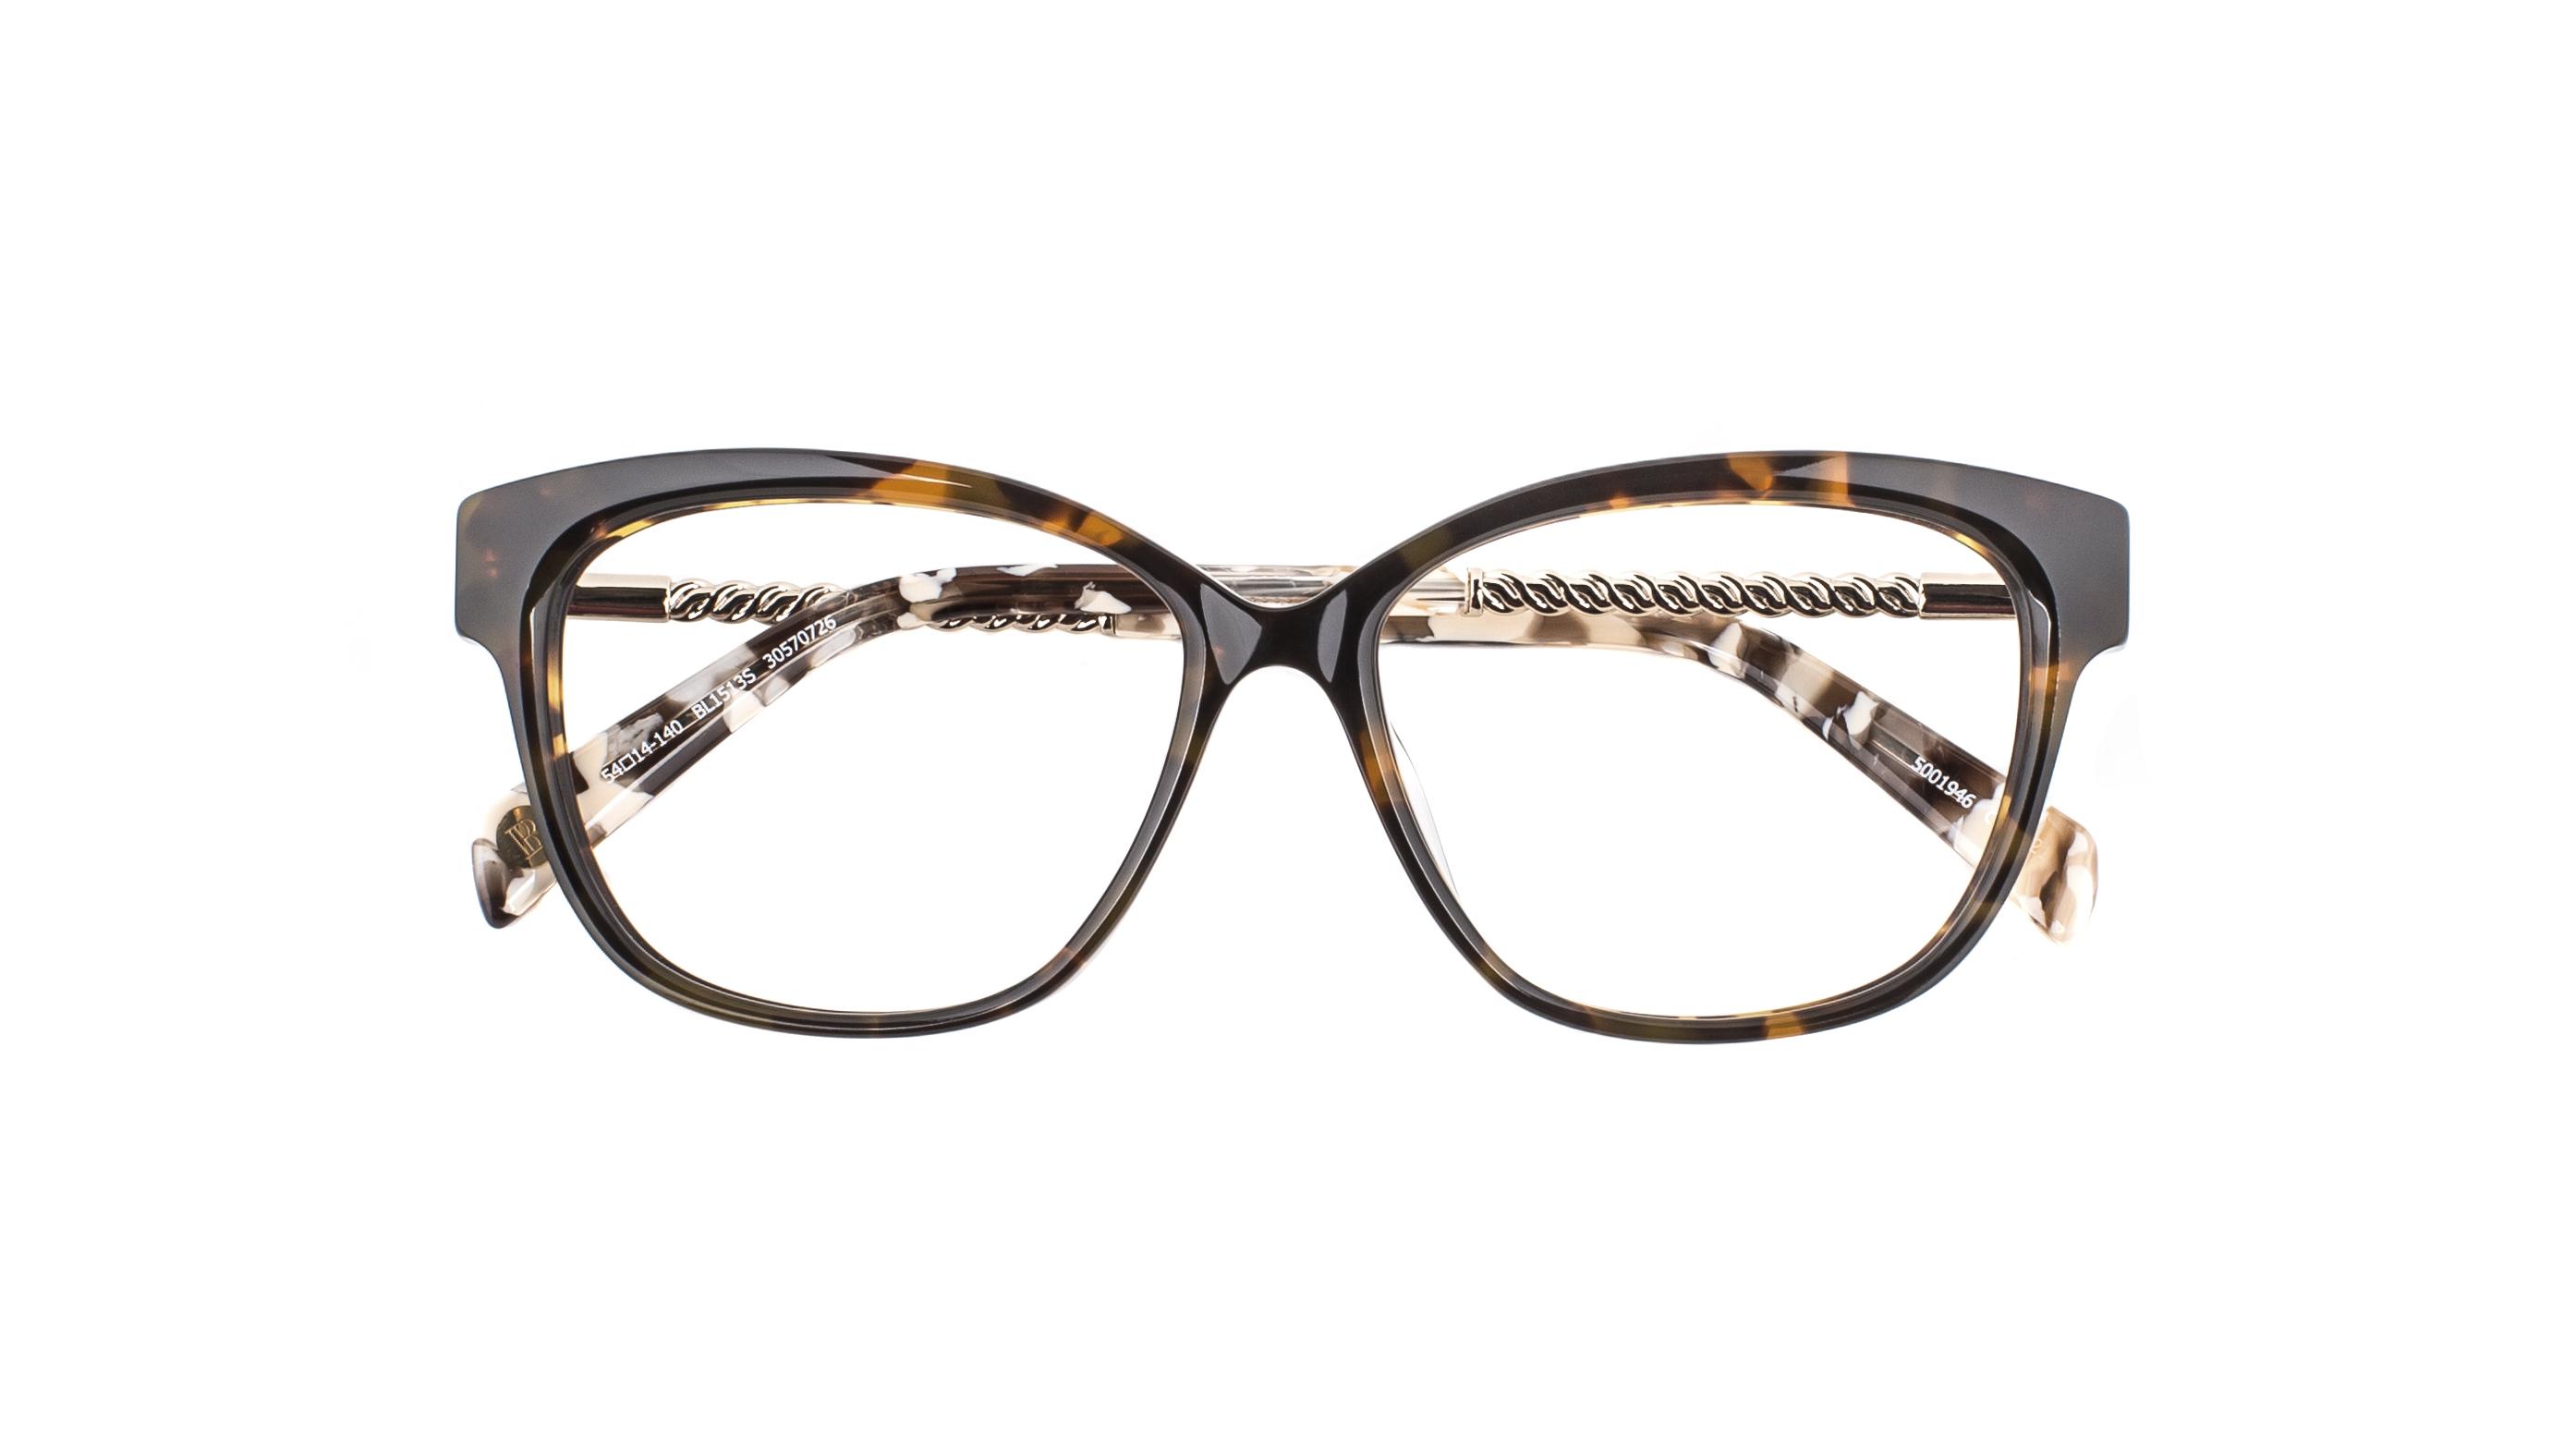 Balmain x Specsavers BL1513S 30570726 - RRP 2 pairs single vision $459 (2)